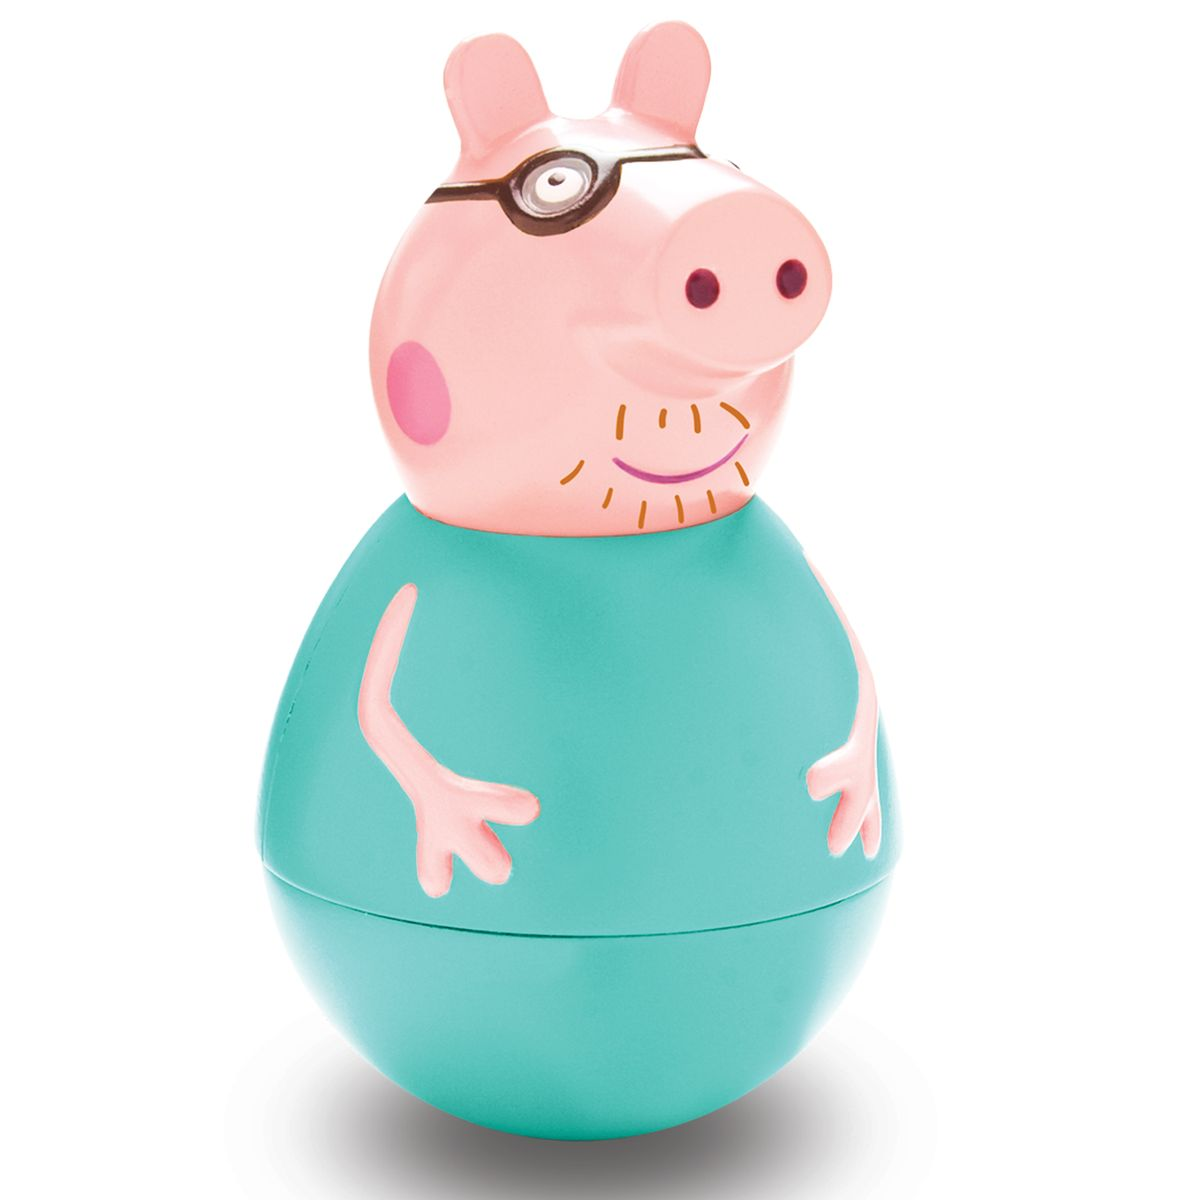 все цены на Peppa Pig Неваляшка Папа Пеппы онлайн